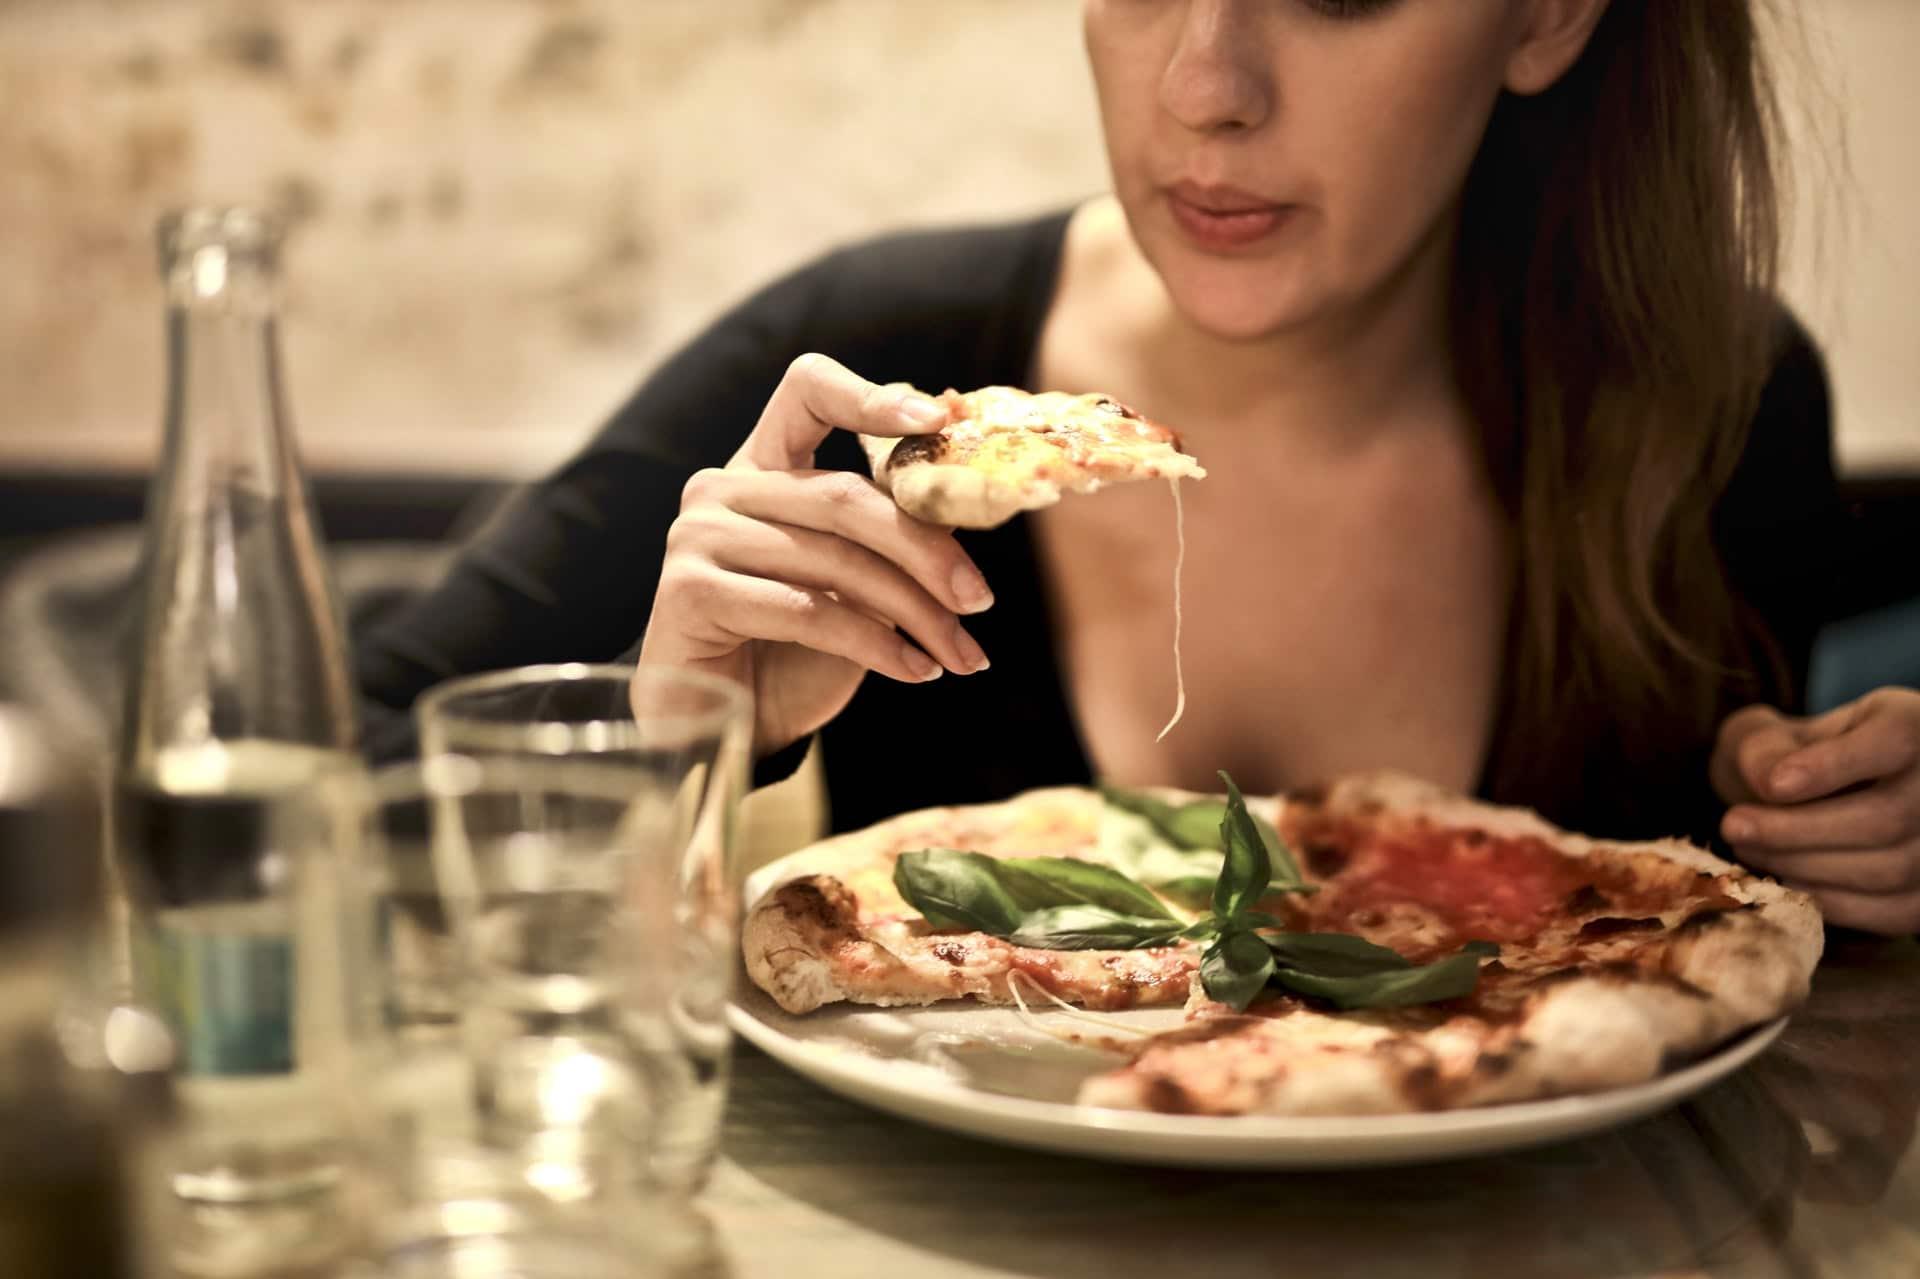 woman eating flatbread pizza